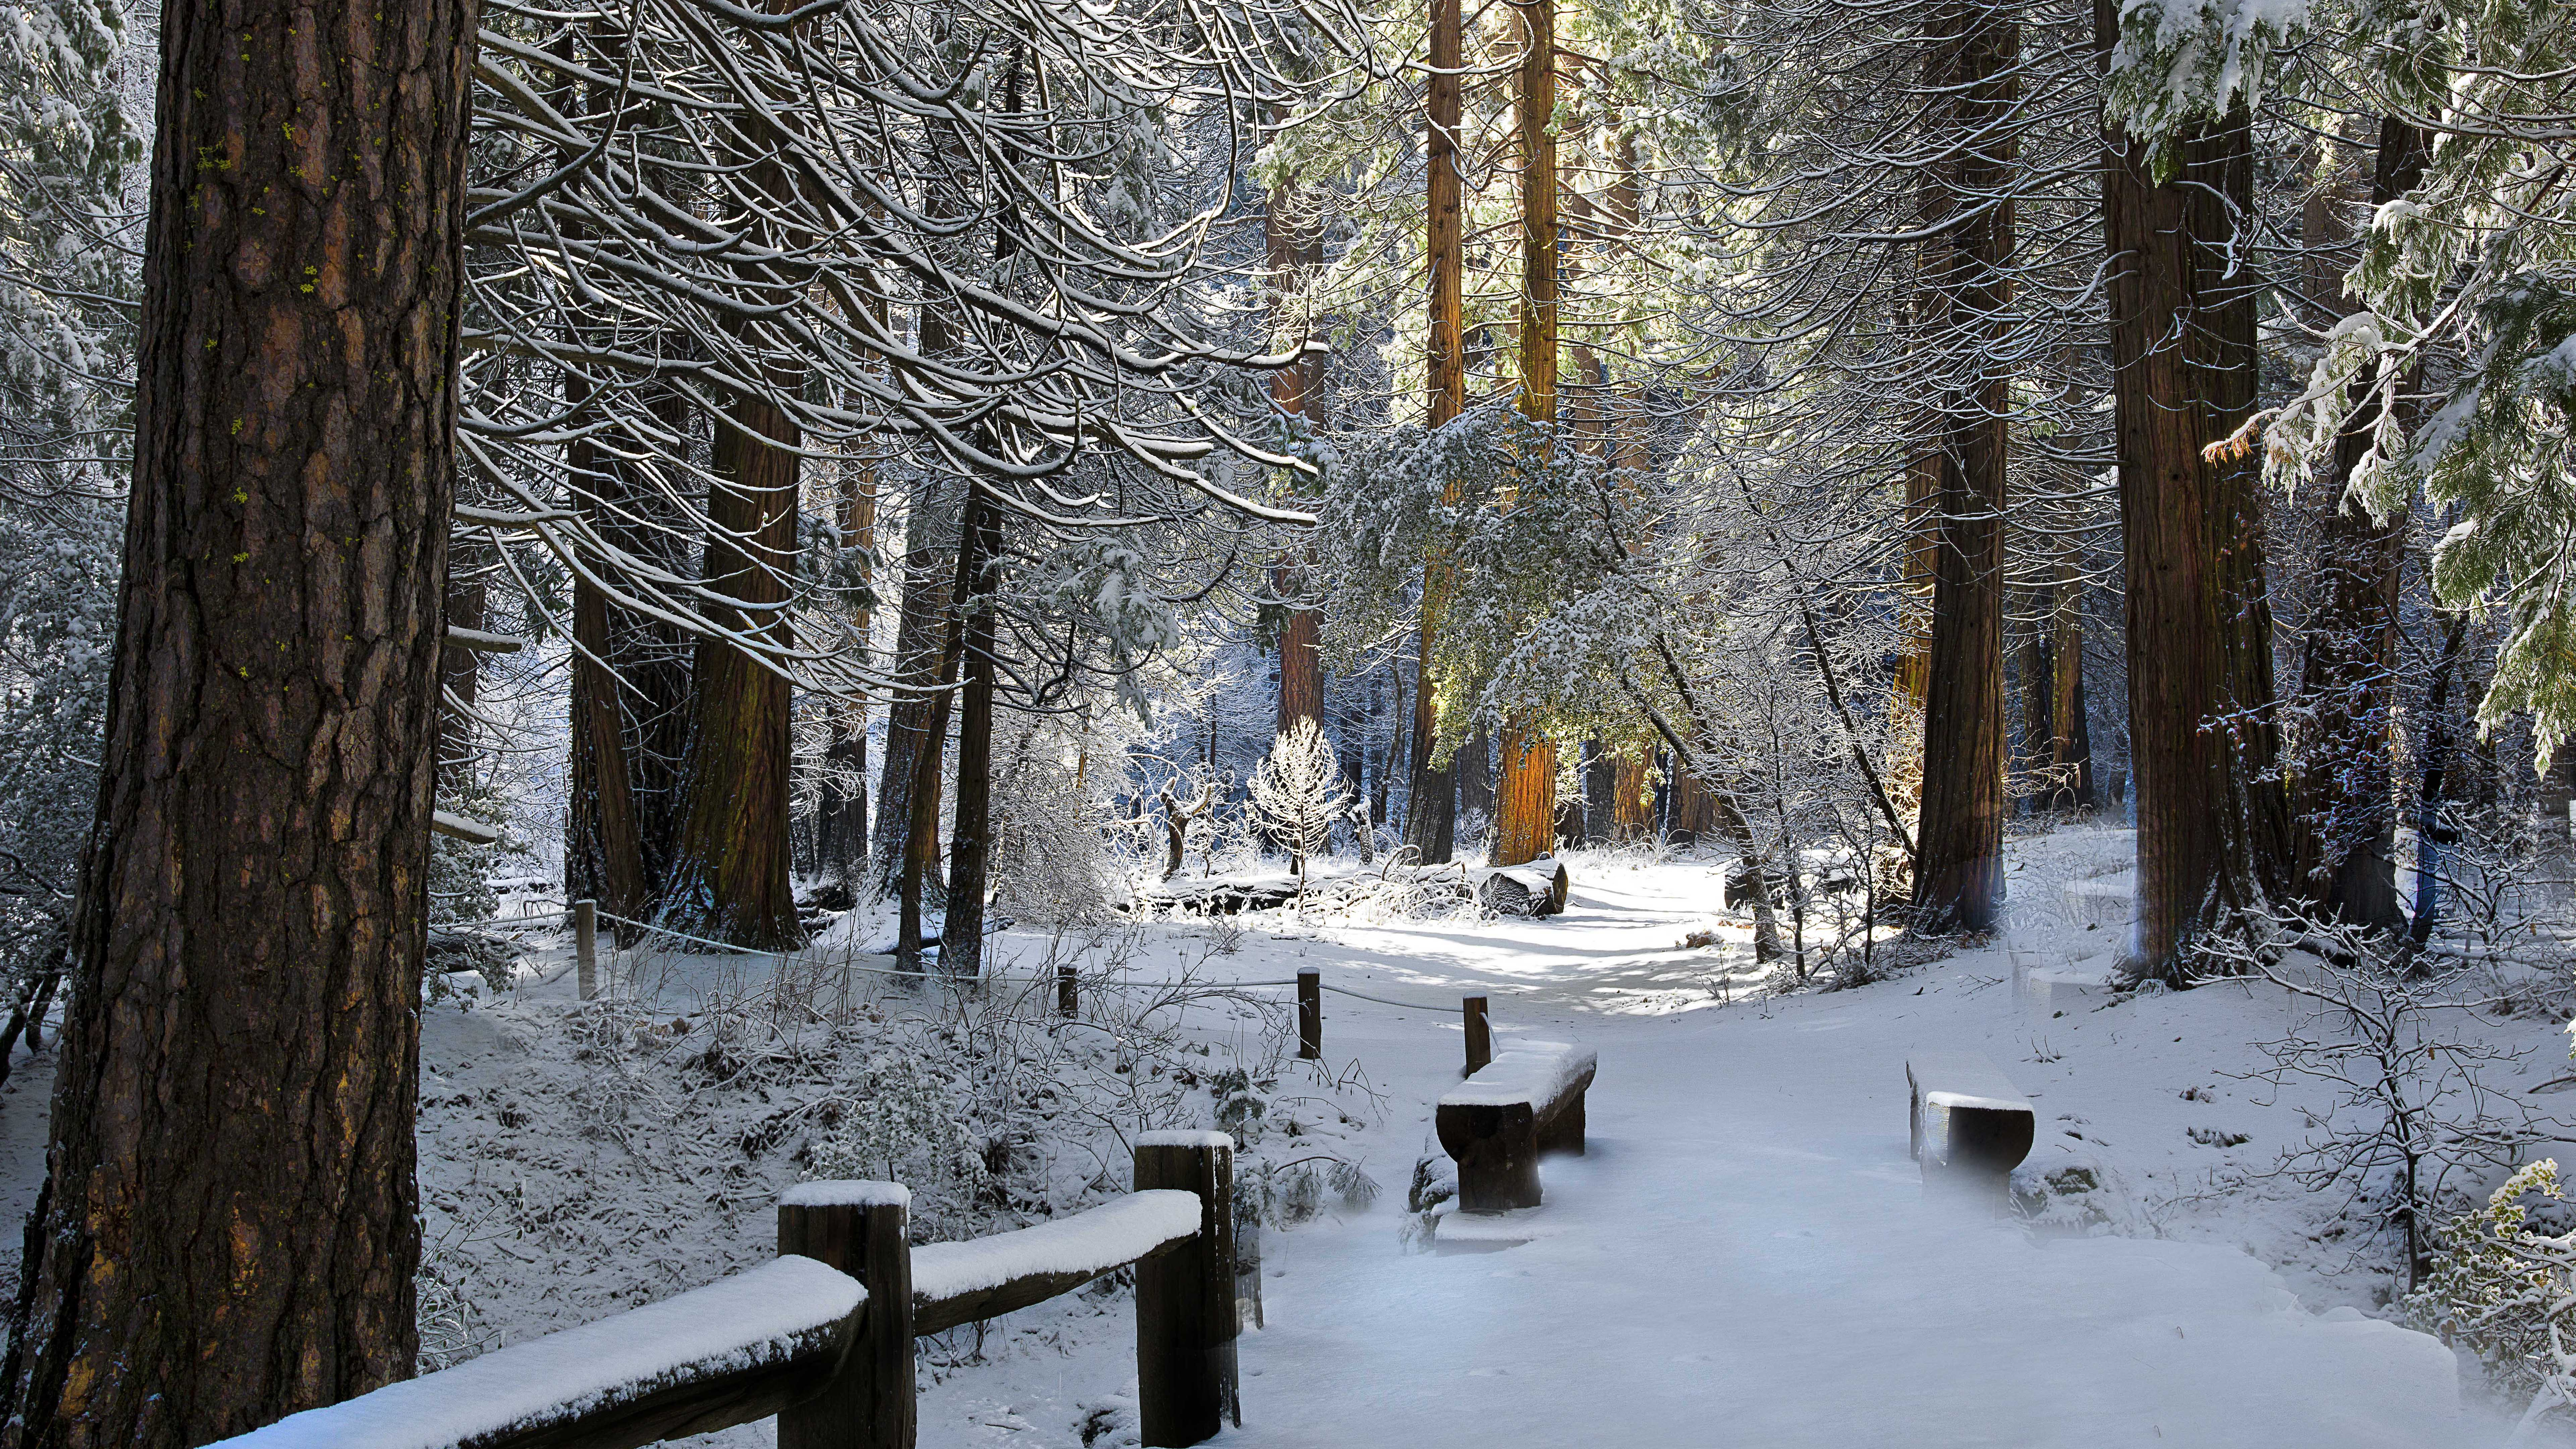 2 Winter Forrest | Free Desktop Wallpapers for Widescreen ...